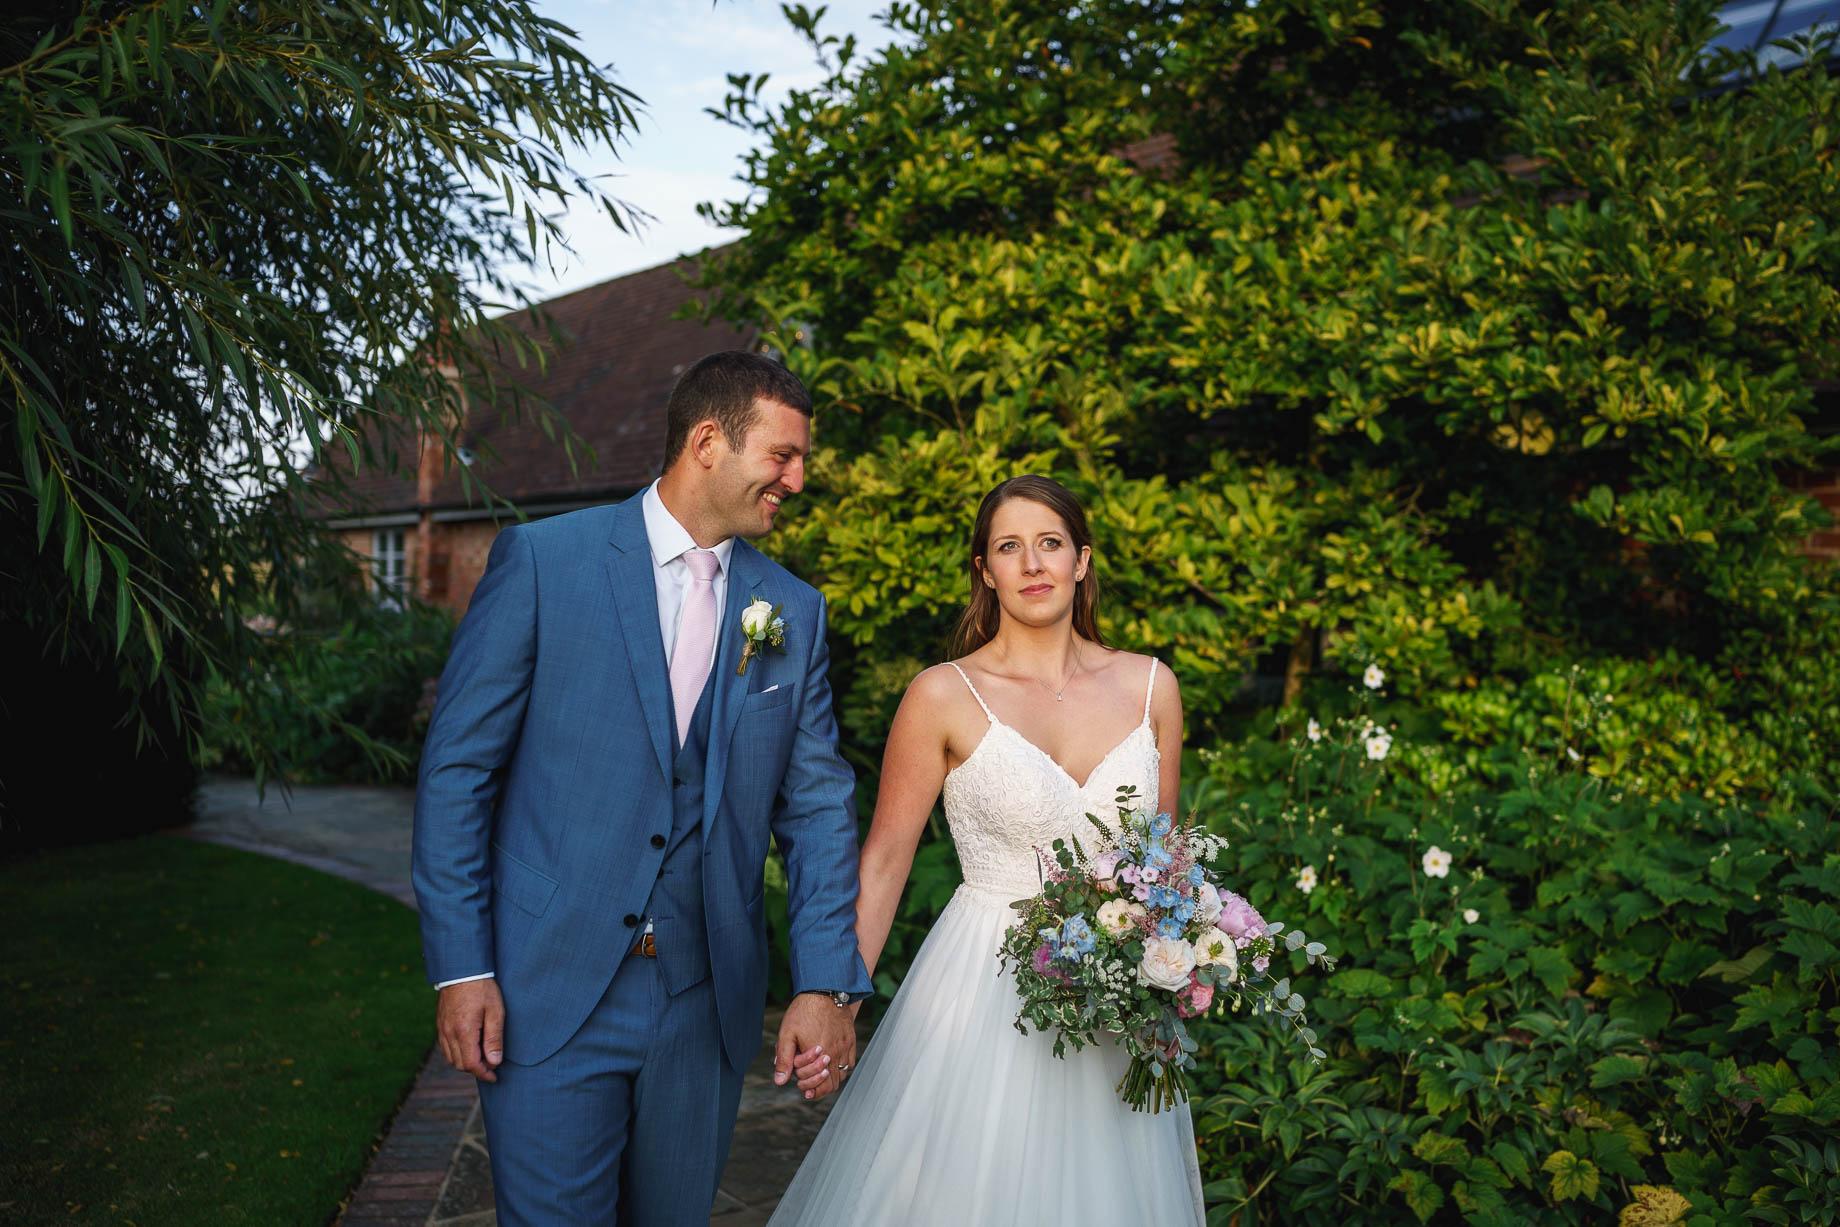 Gate Street Barn wedding photography